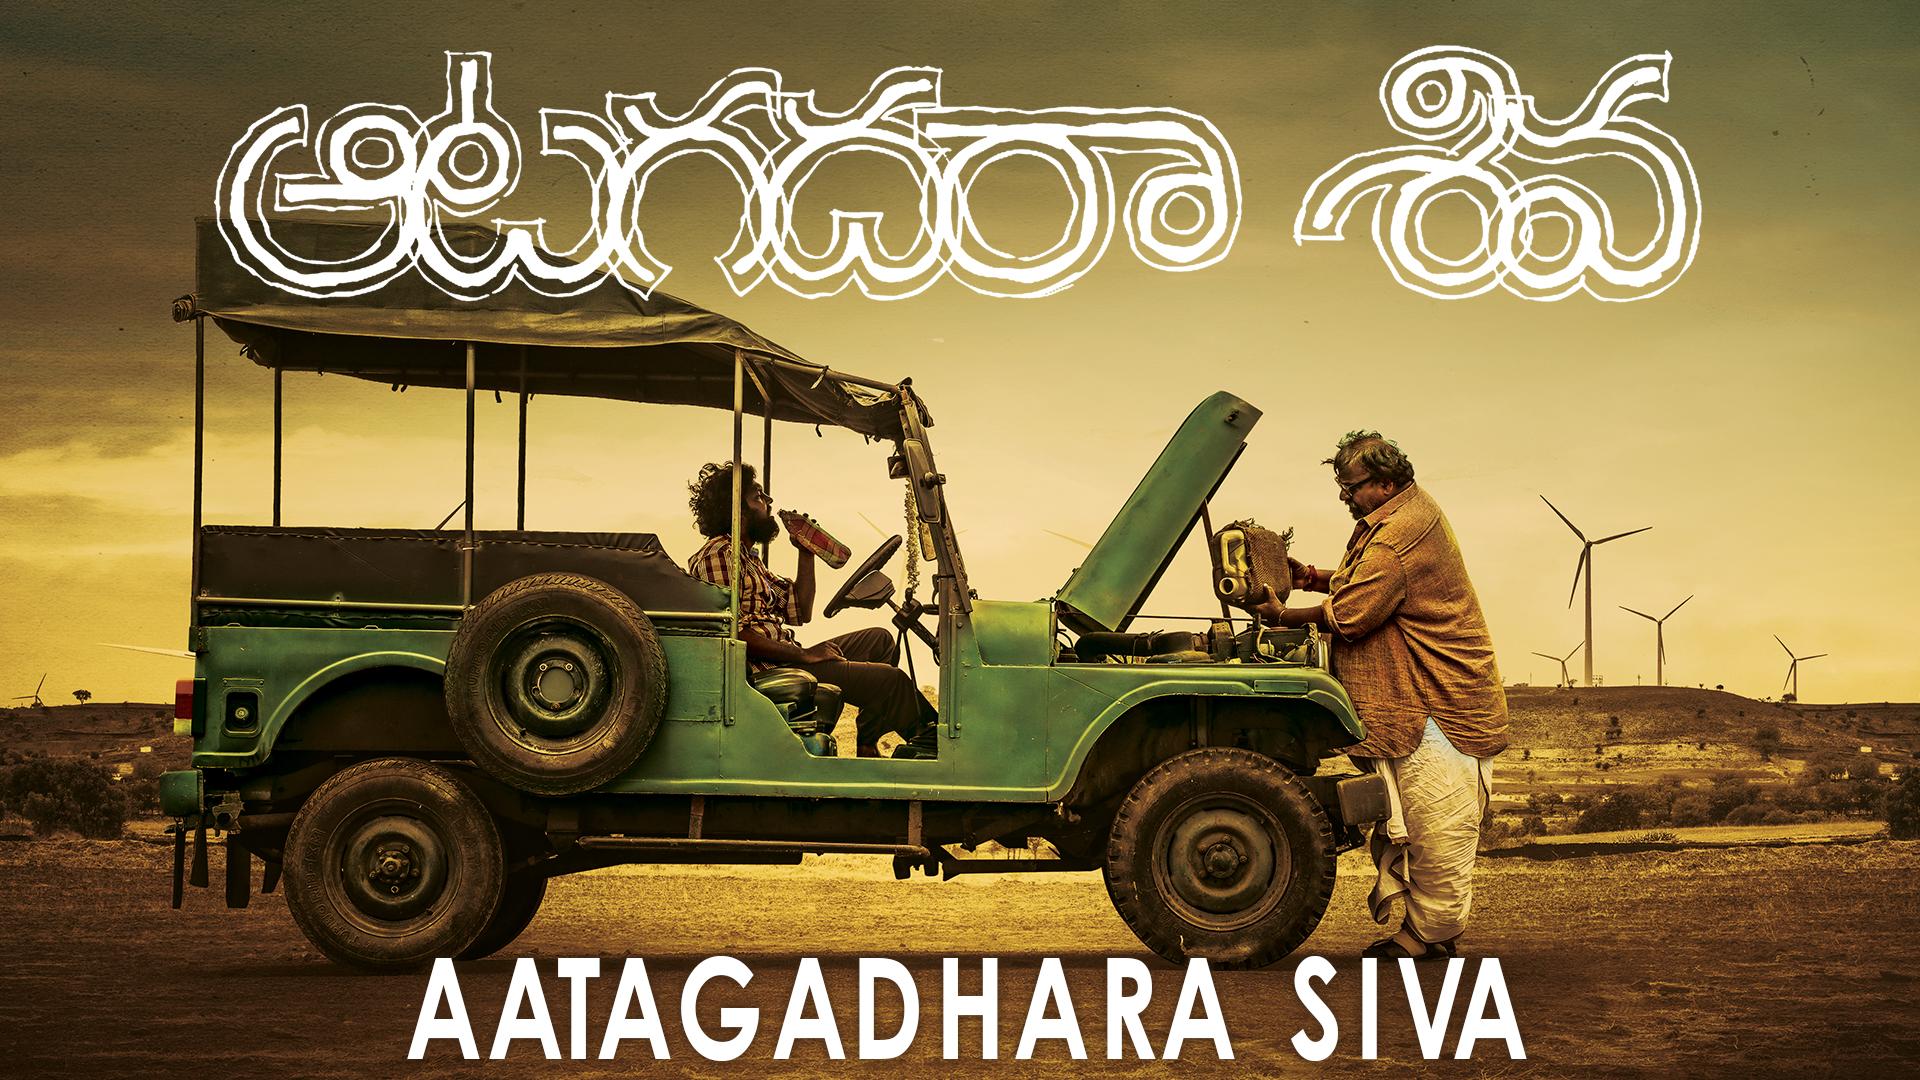 Aatagadharaa Siva